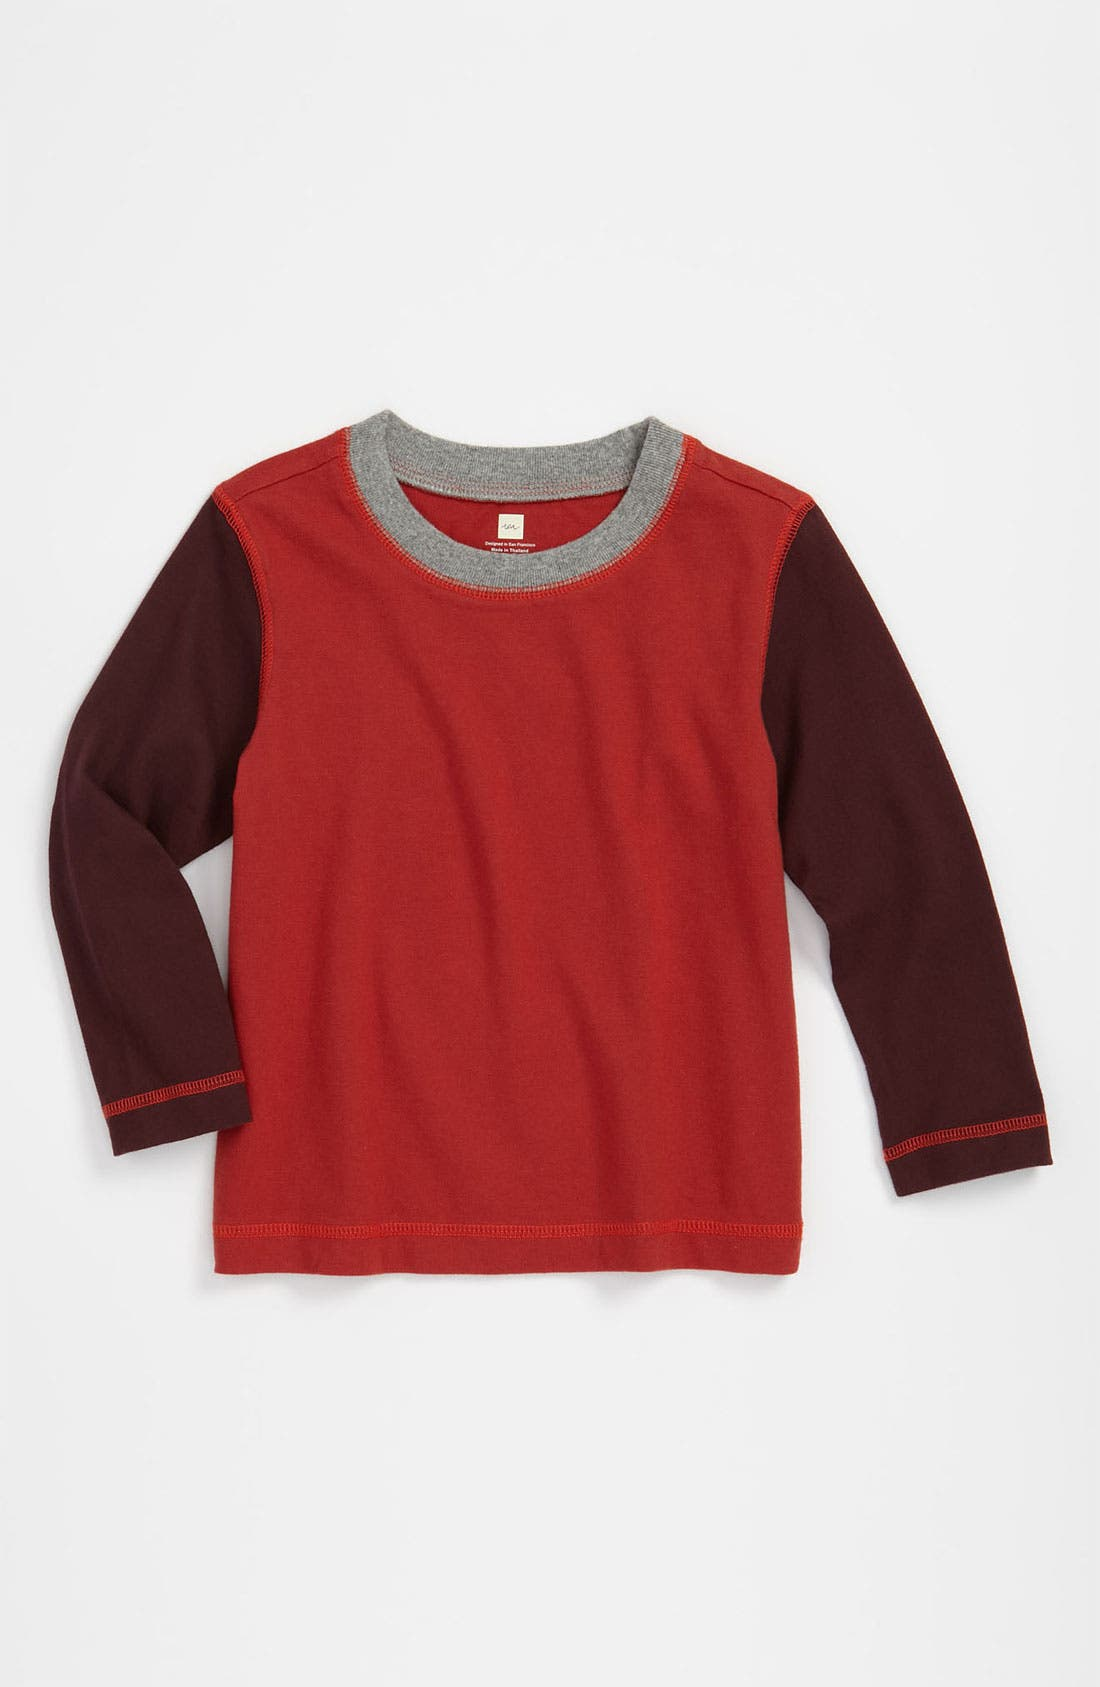 Main Image - Tea Collection 'Cool Colorblock' T-Shirt (Toddler)